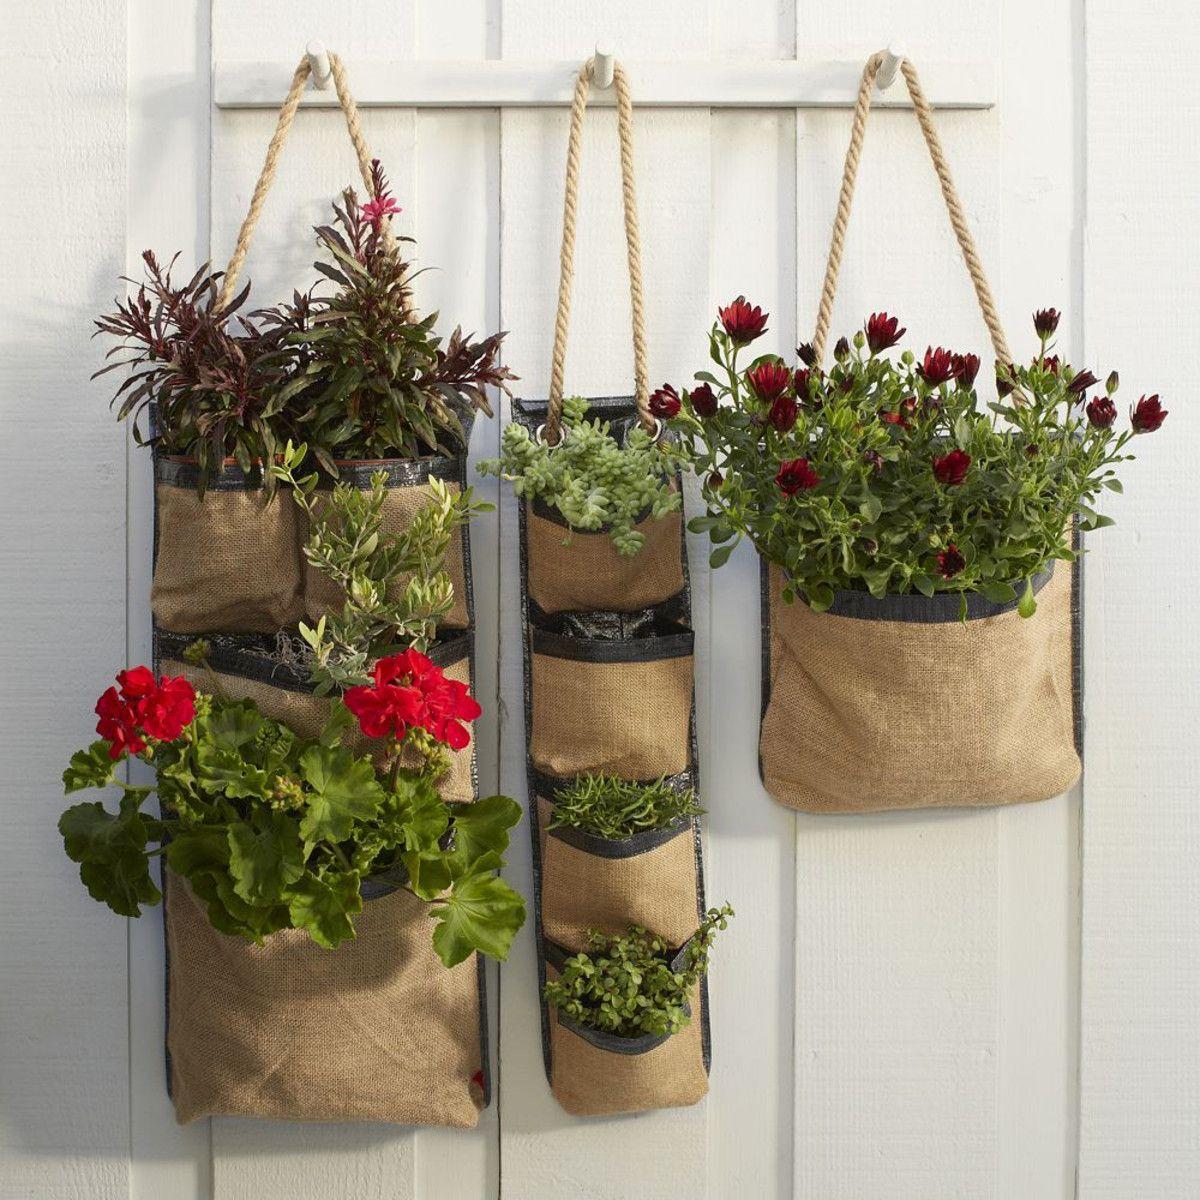 Hanging Bag Planters Diy hanging planter, Planters